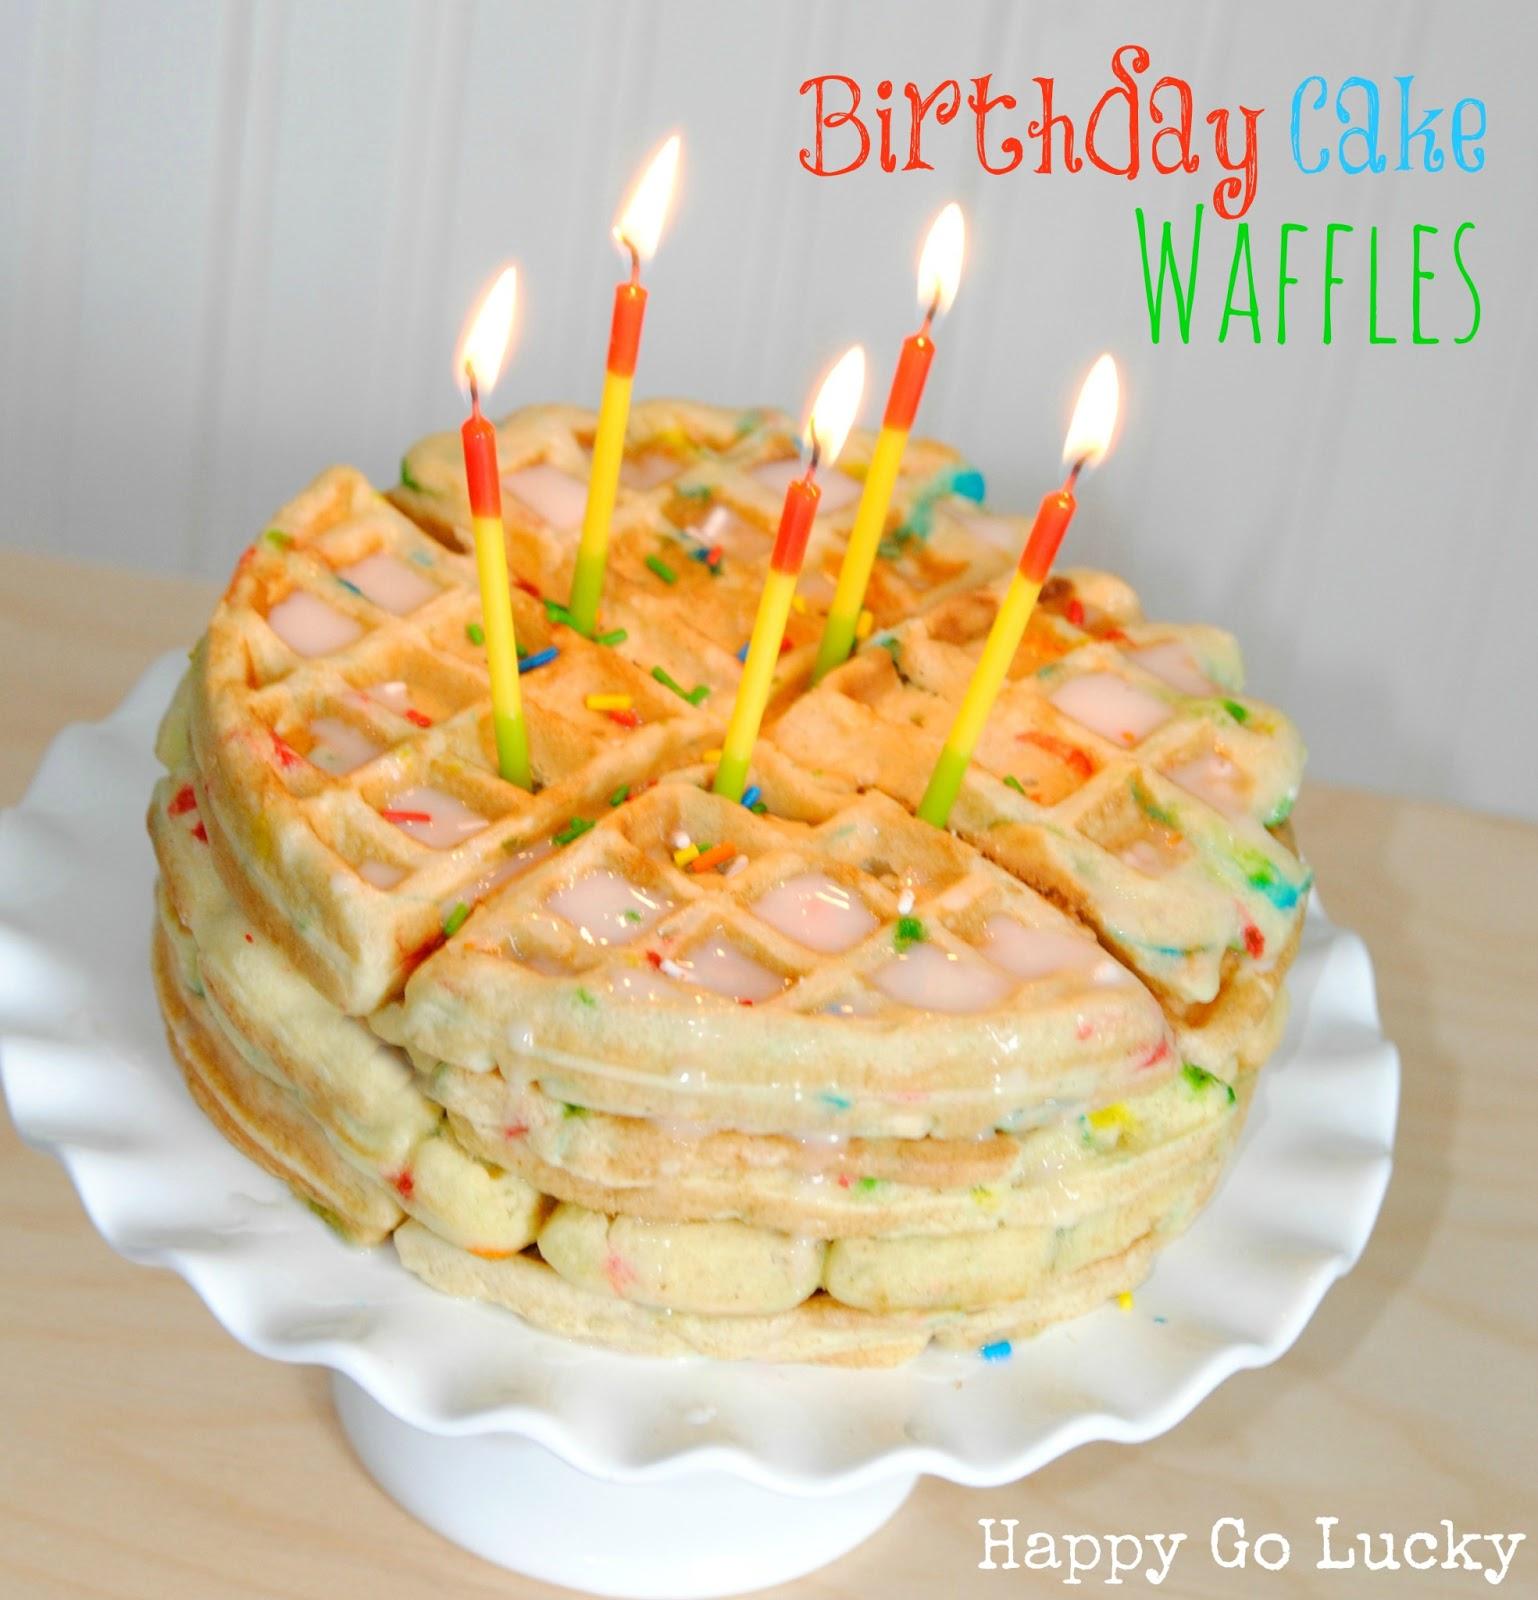 Waffle Wednesday Happy Birthday America Endlessly Waffle